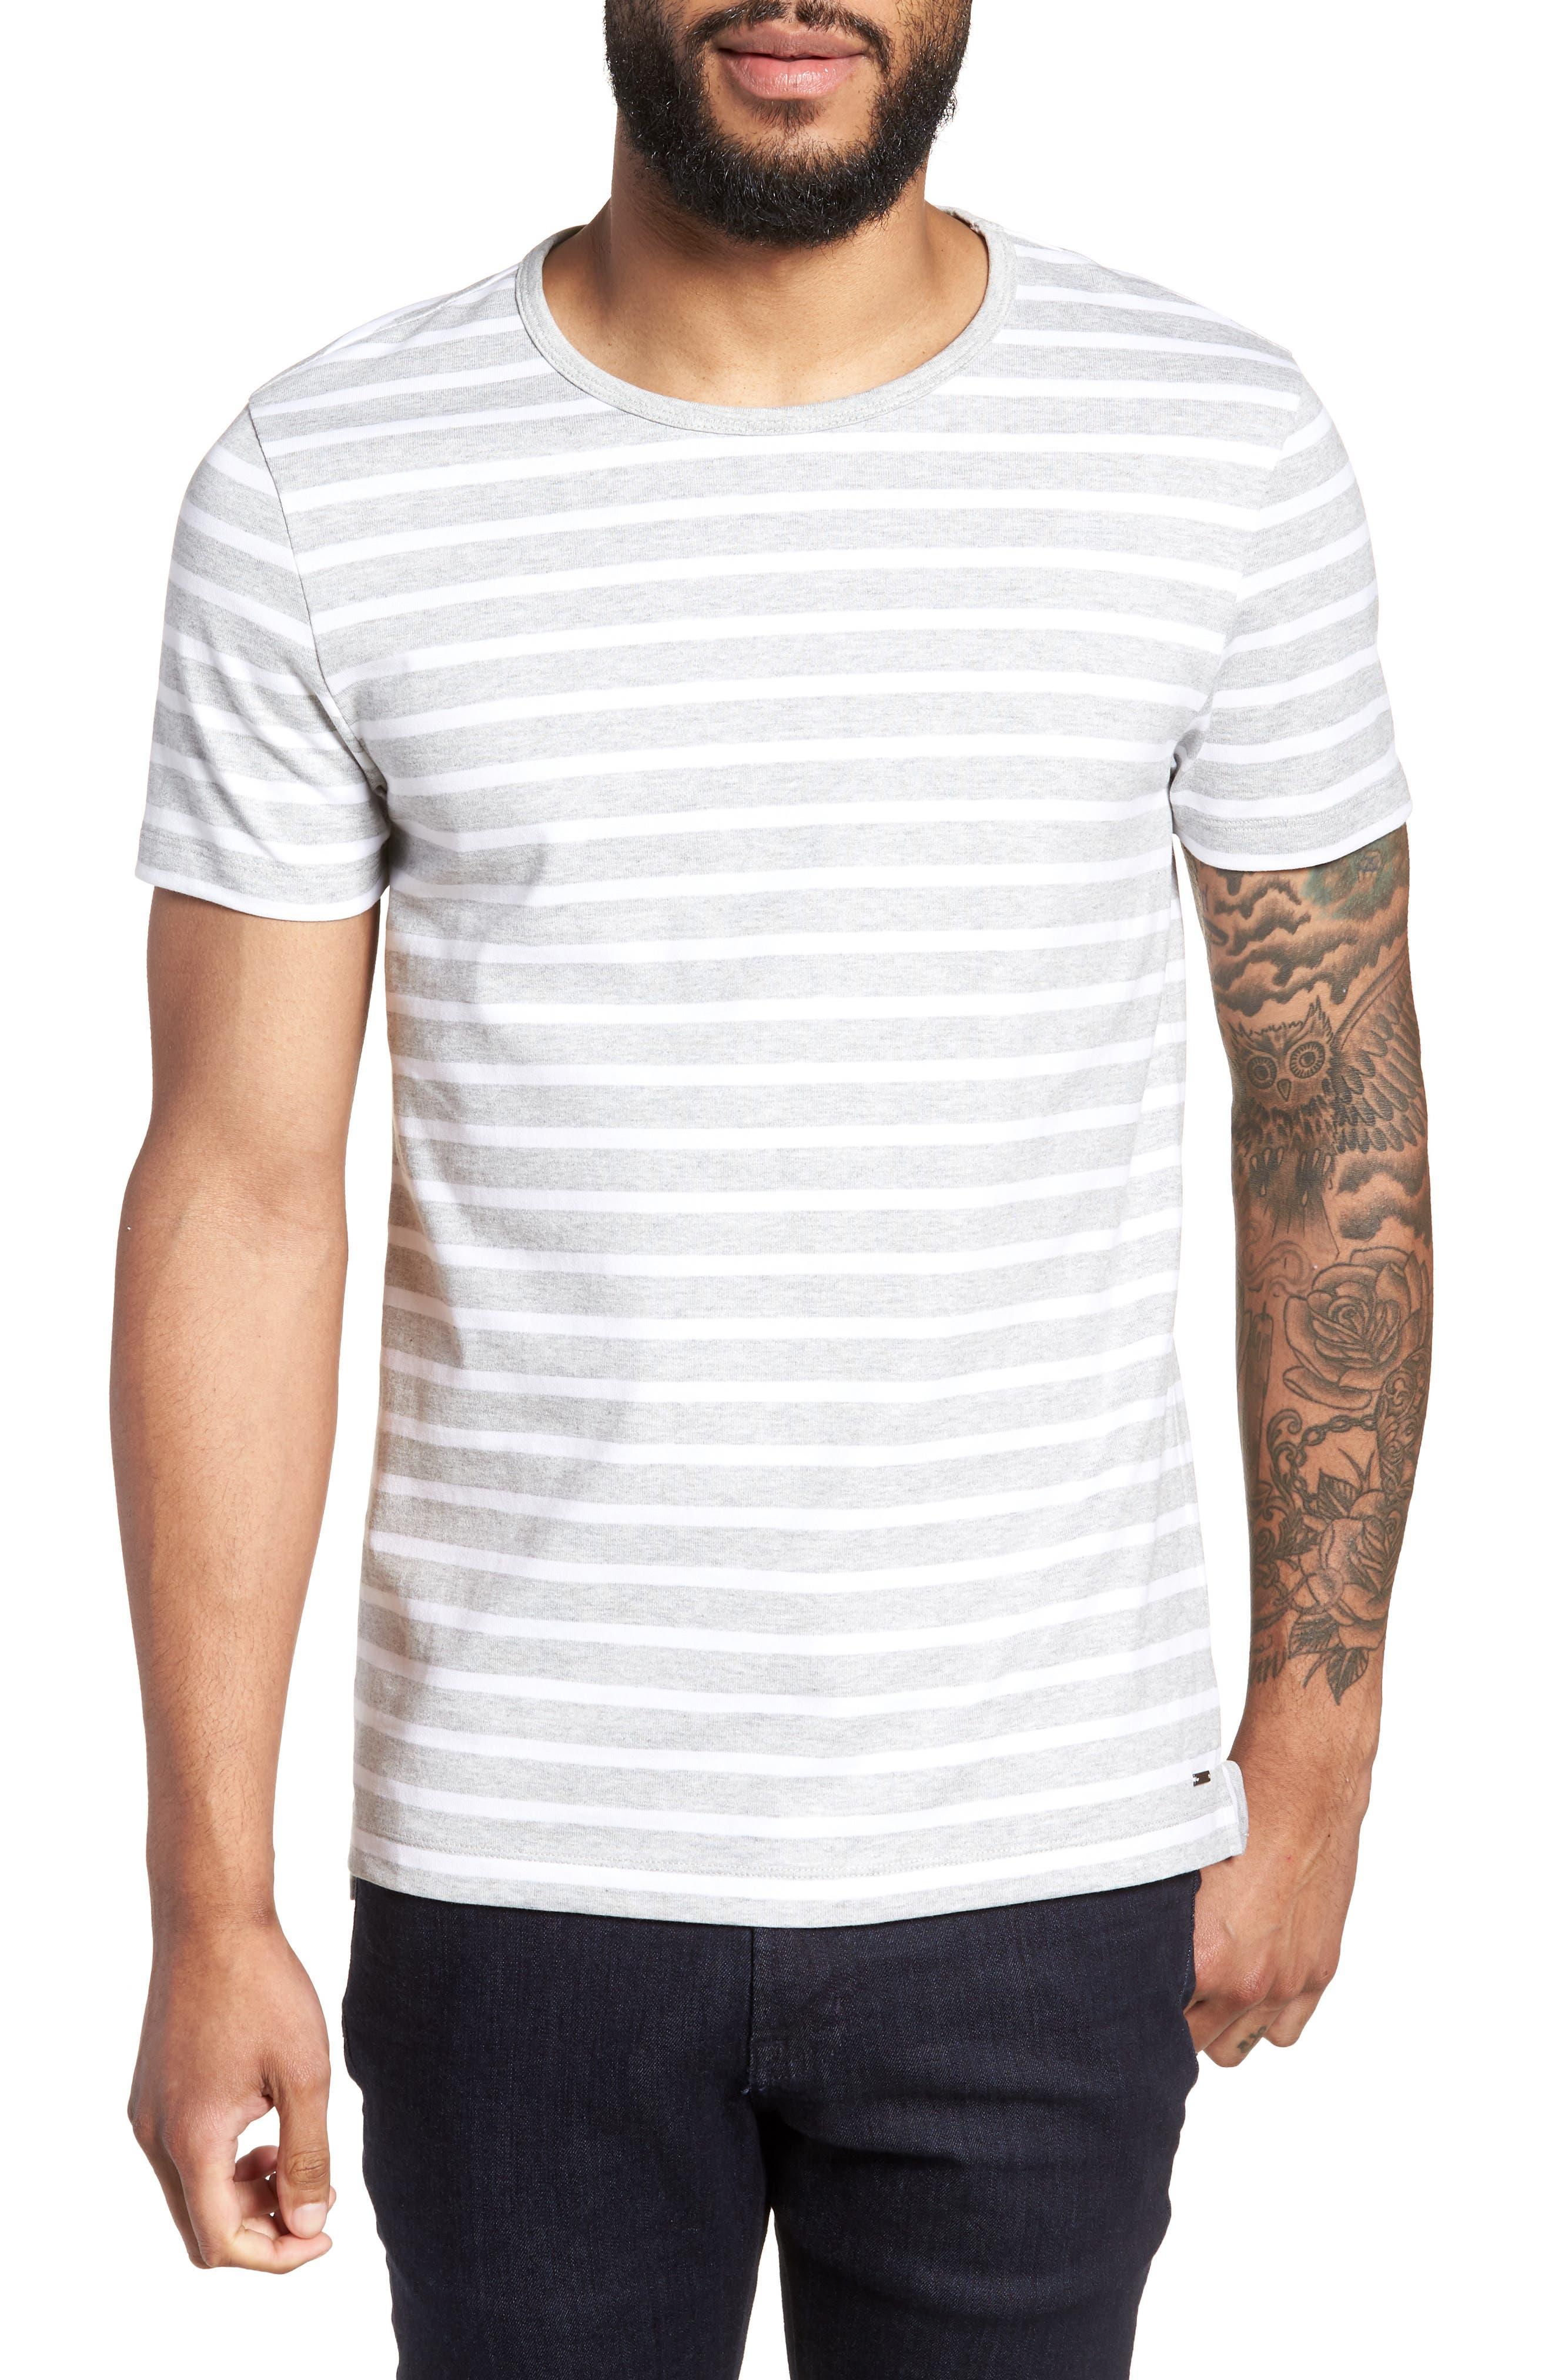 Tessler Slim Fit Crewneck T-Shirt,                         Main,                         color, 072